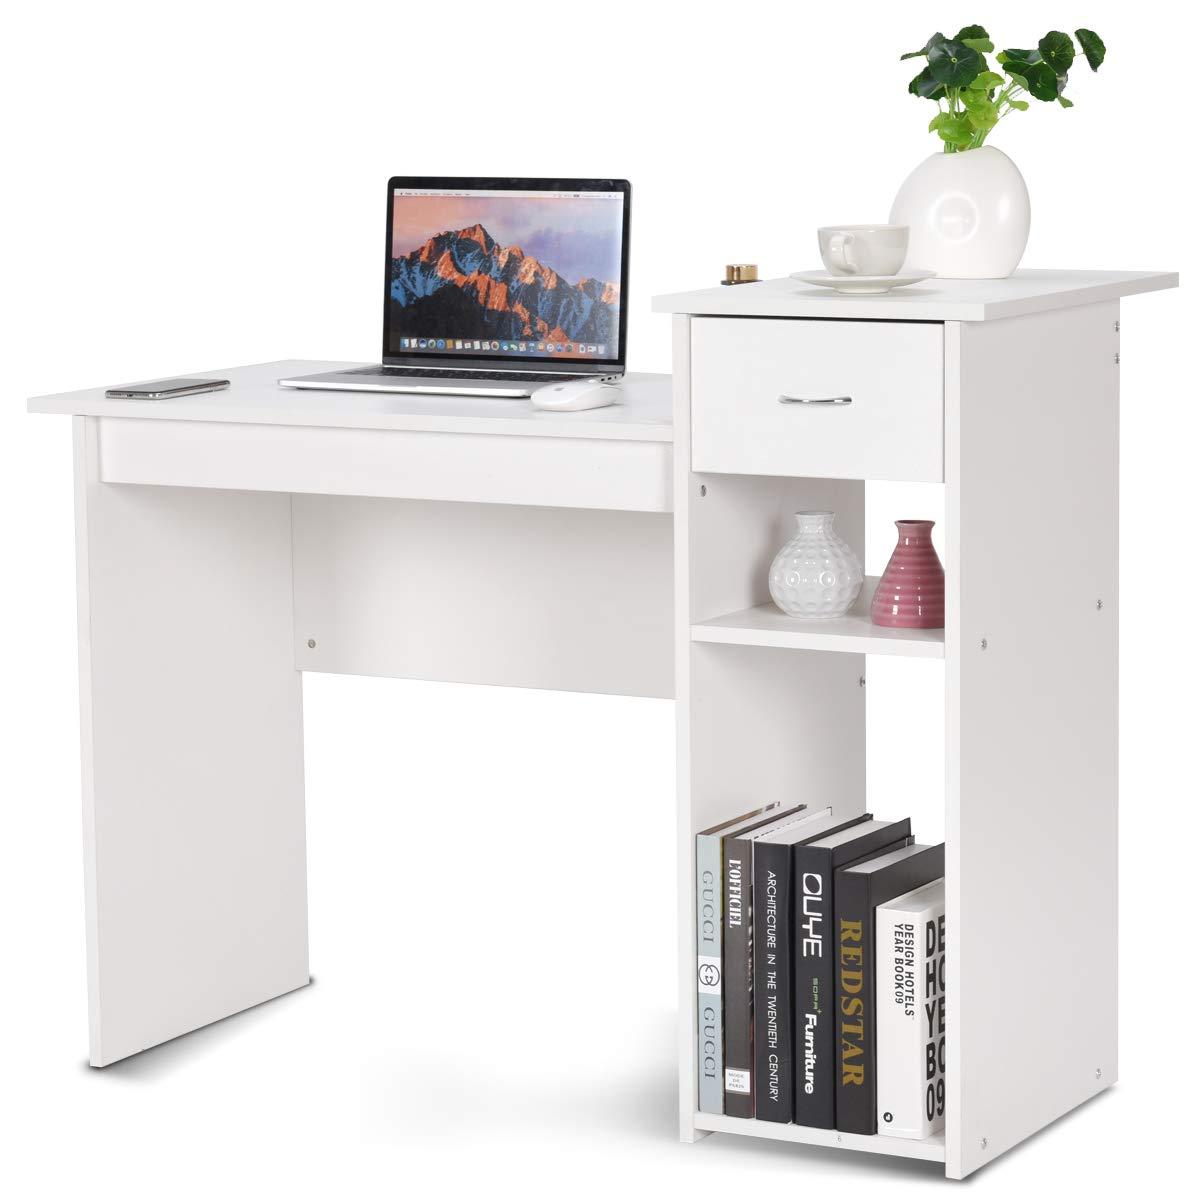 Amazon.com: TANGKULA - Juego de mesa de madera para ...